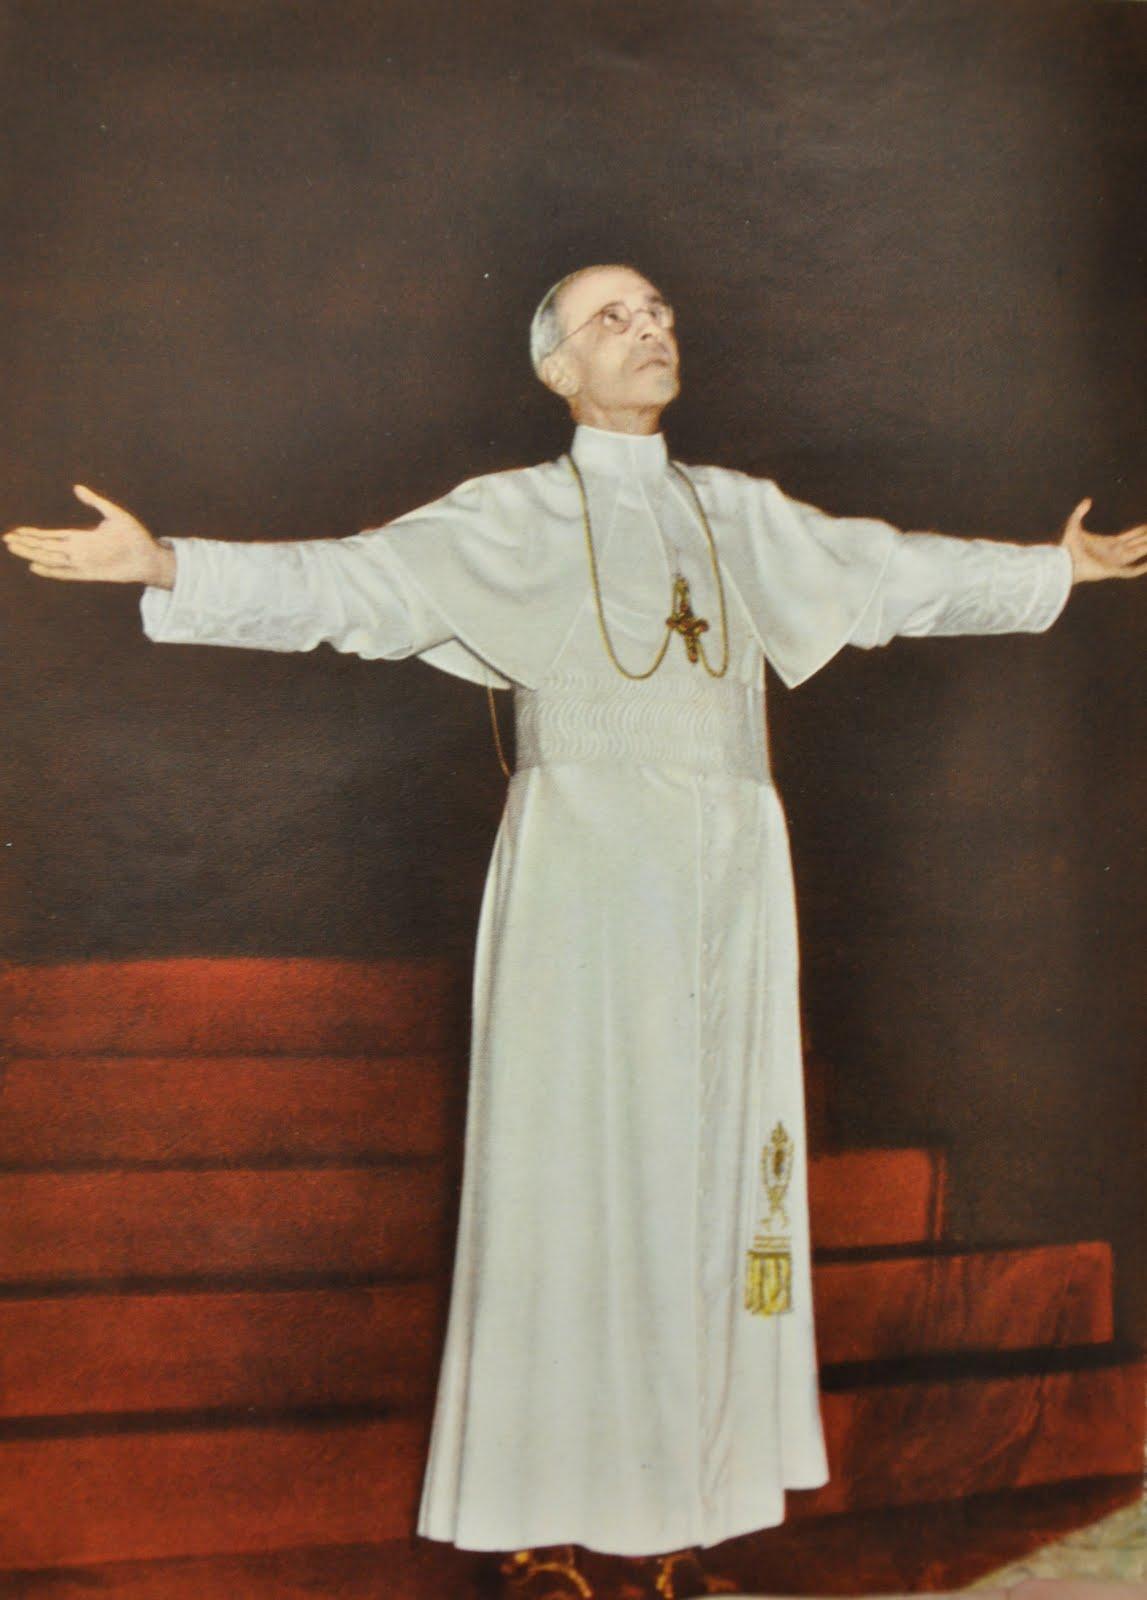 Fr Ray Blake S Blog Pius Xii The Reformer